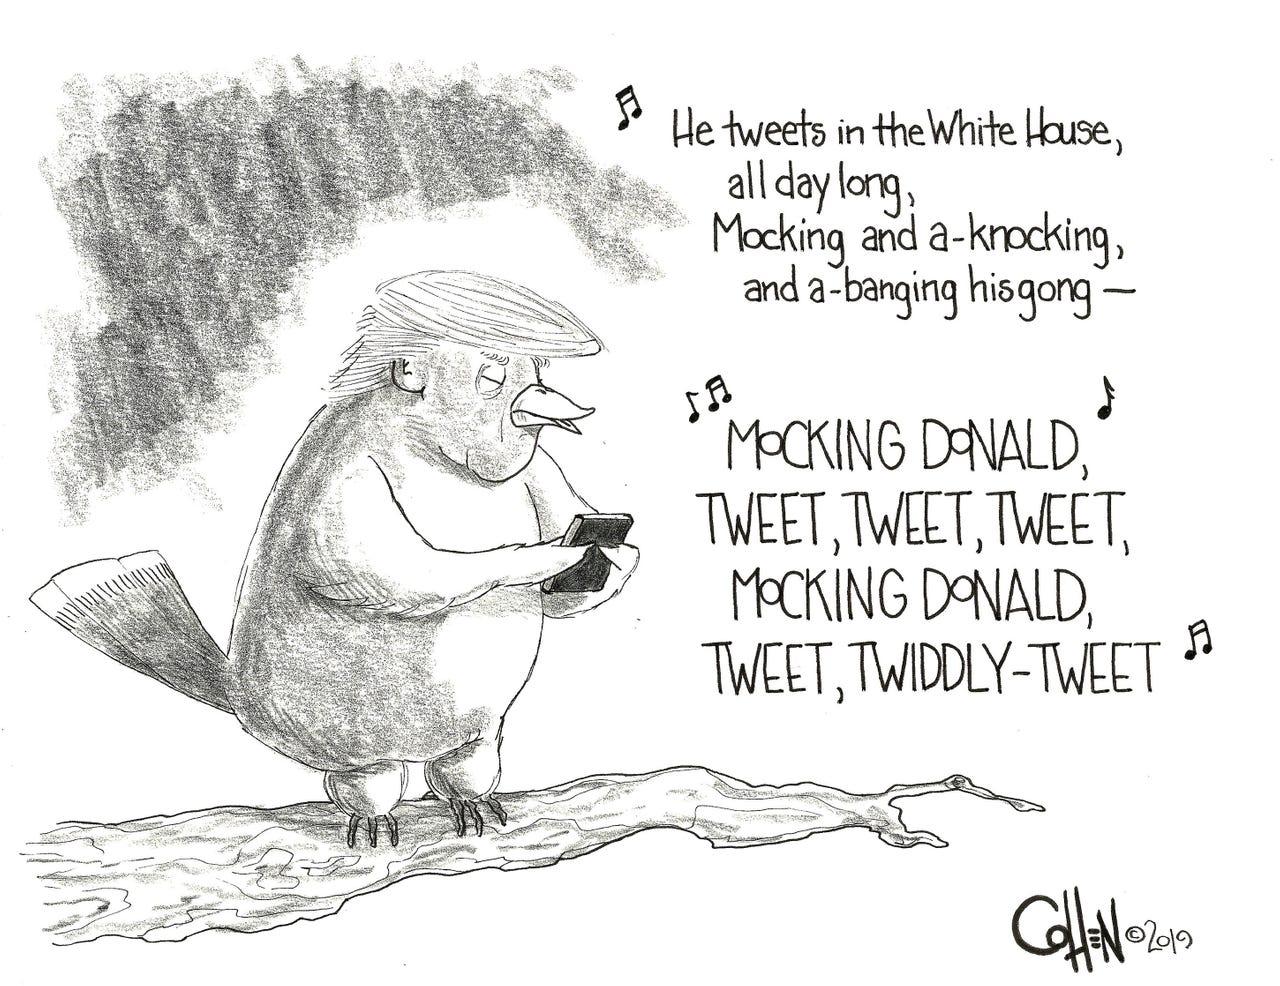 Mockin' Donald